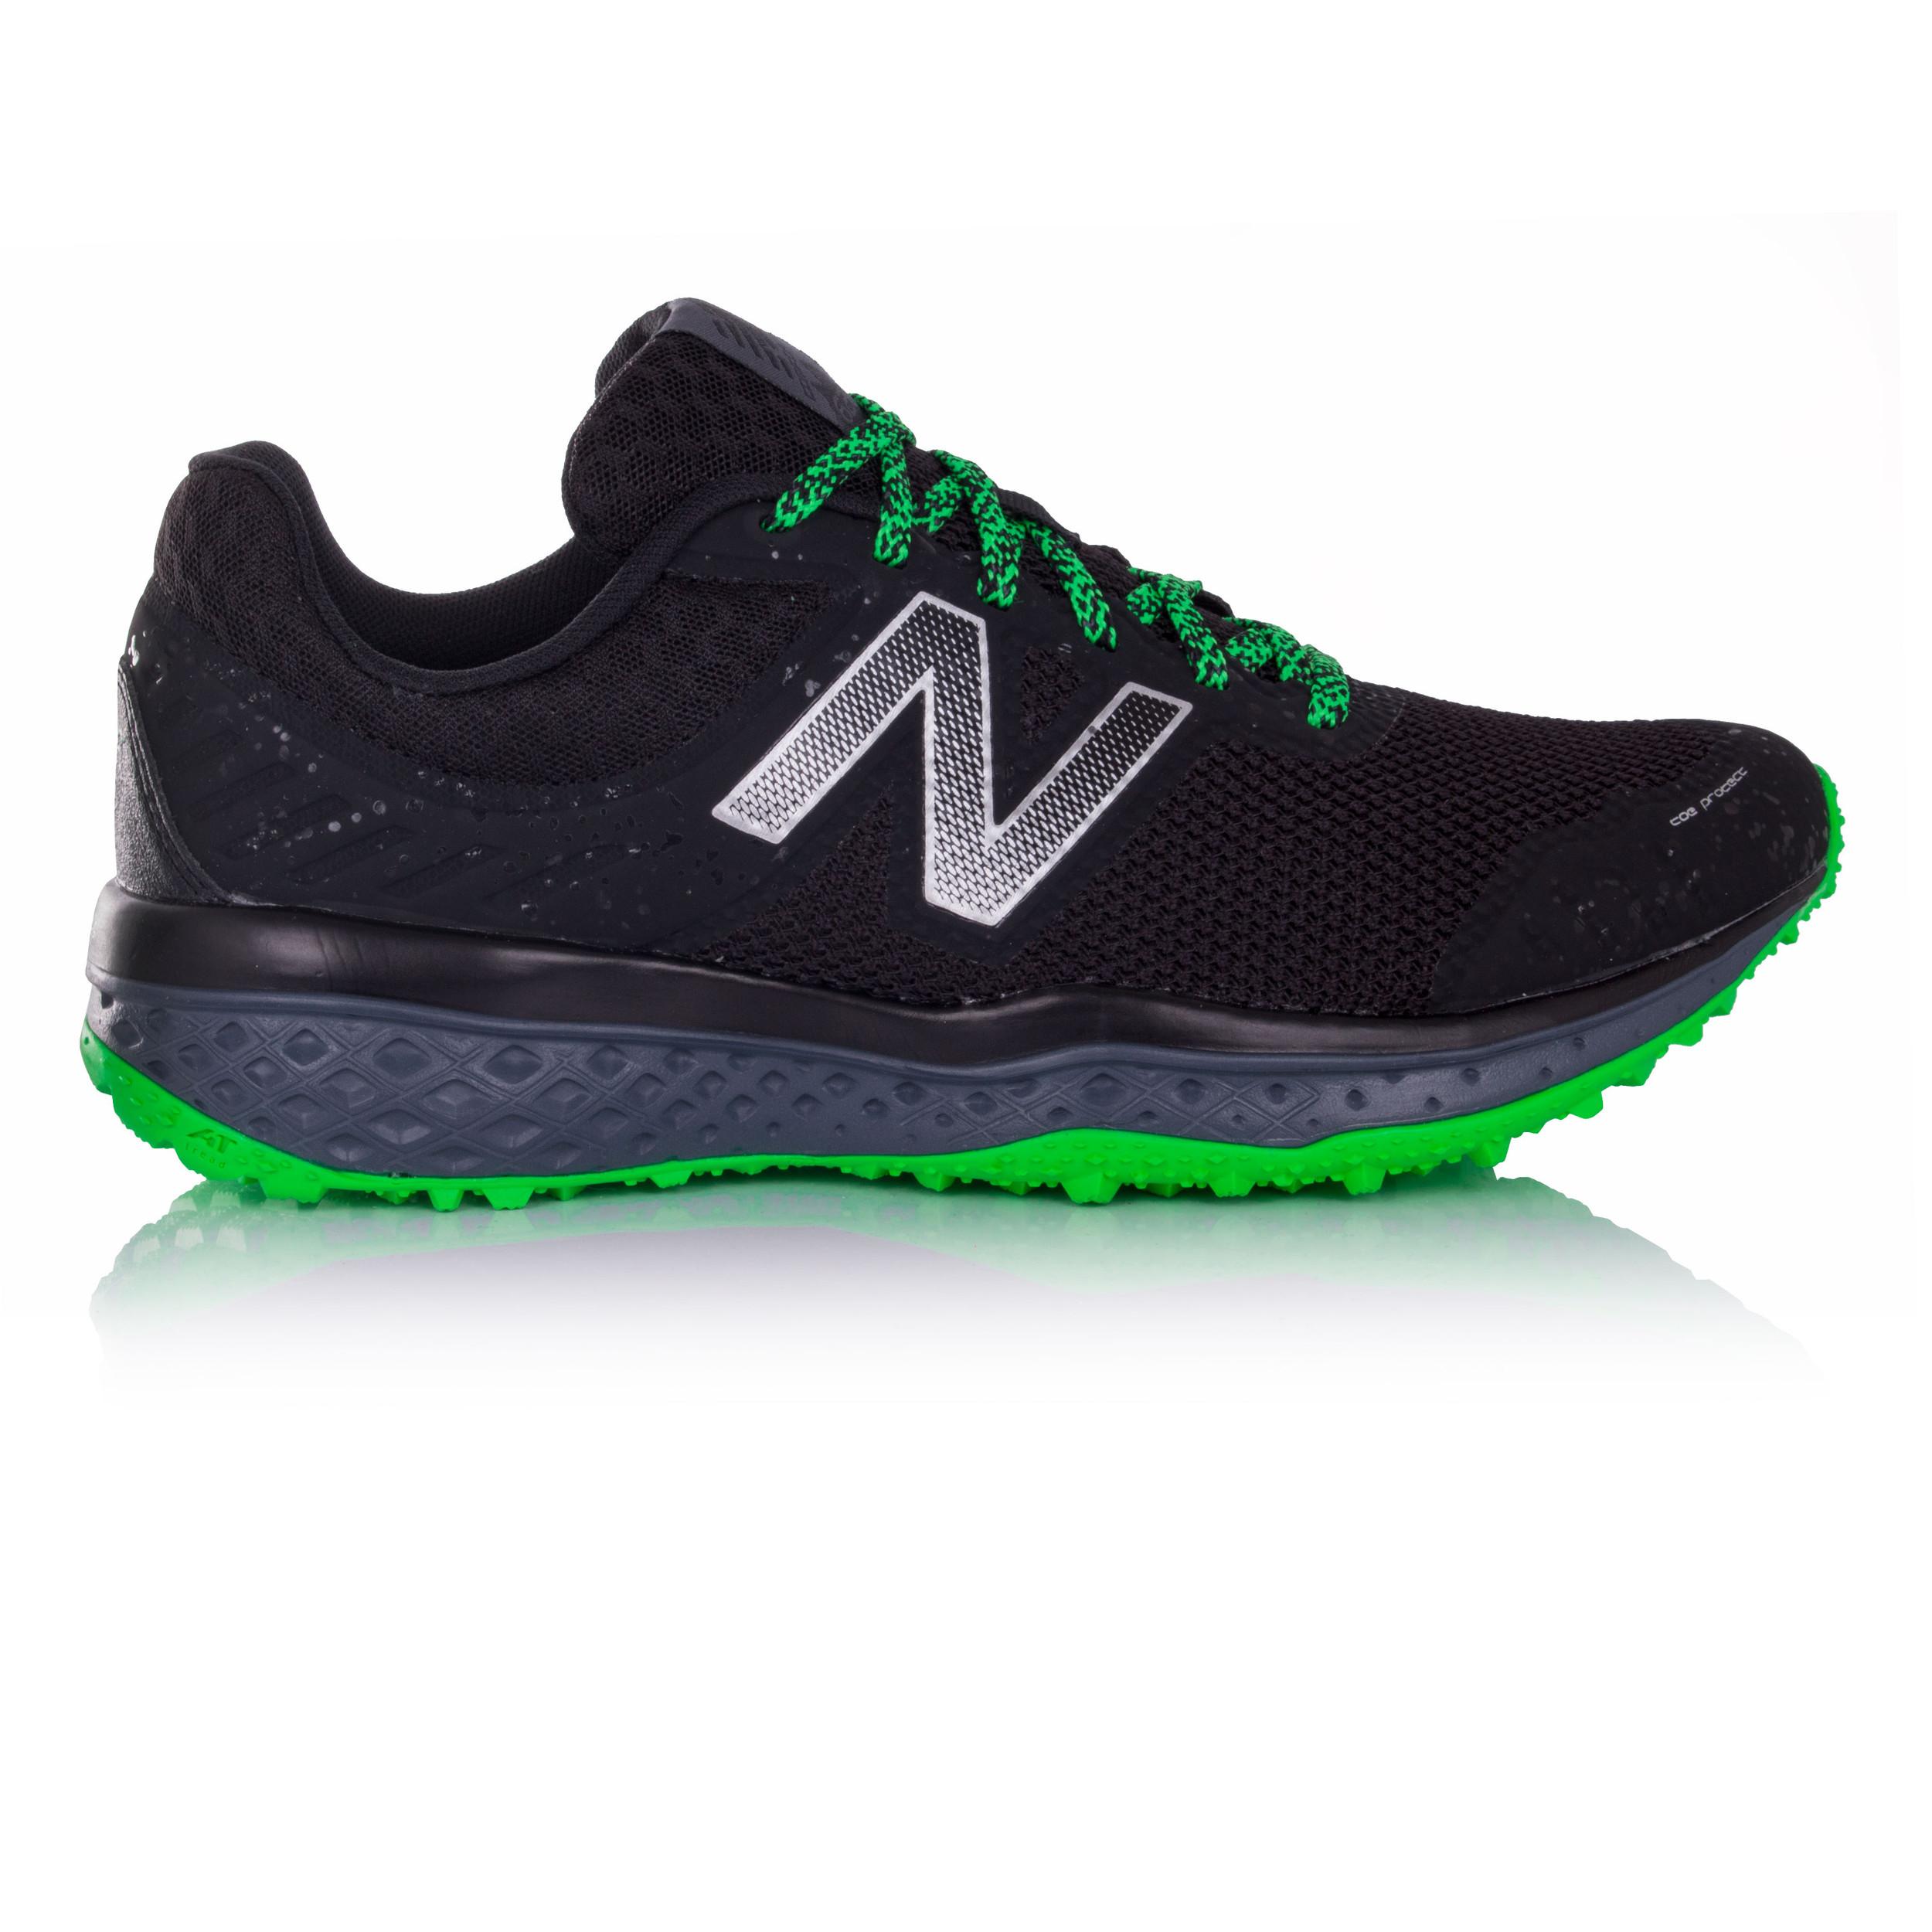 Hommes Vert Balance Noir Pied Chaussures Course À New Trail Mt620v2 Jc35uF1lKT